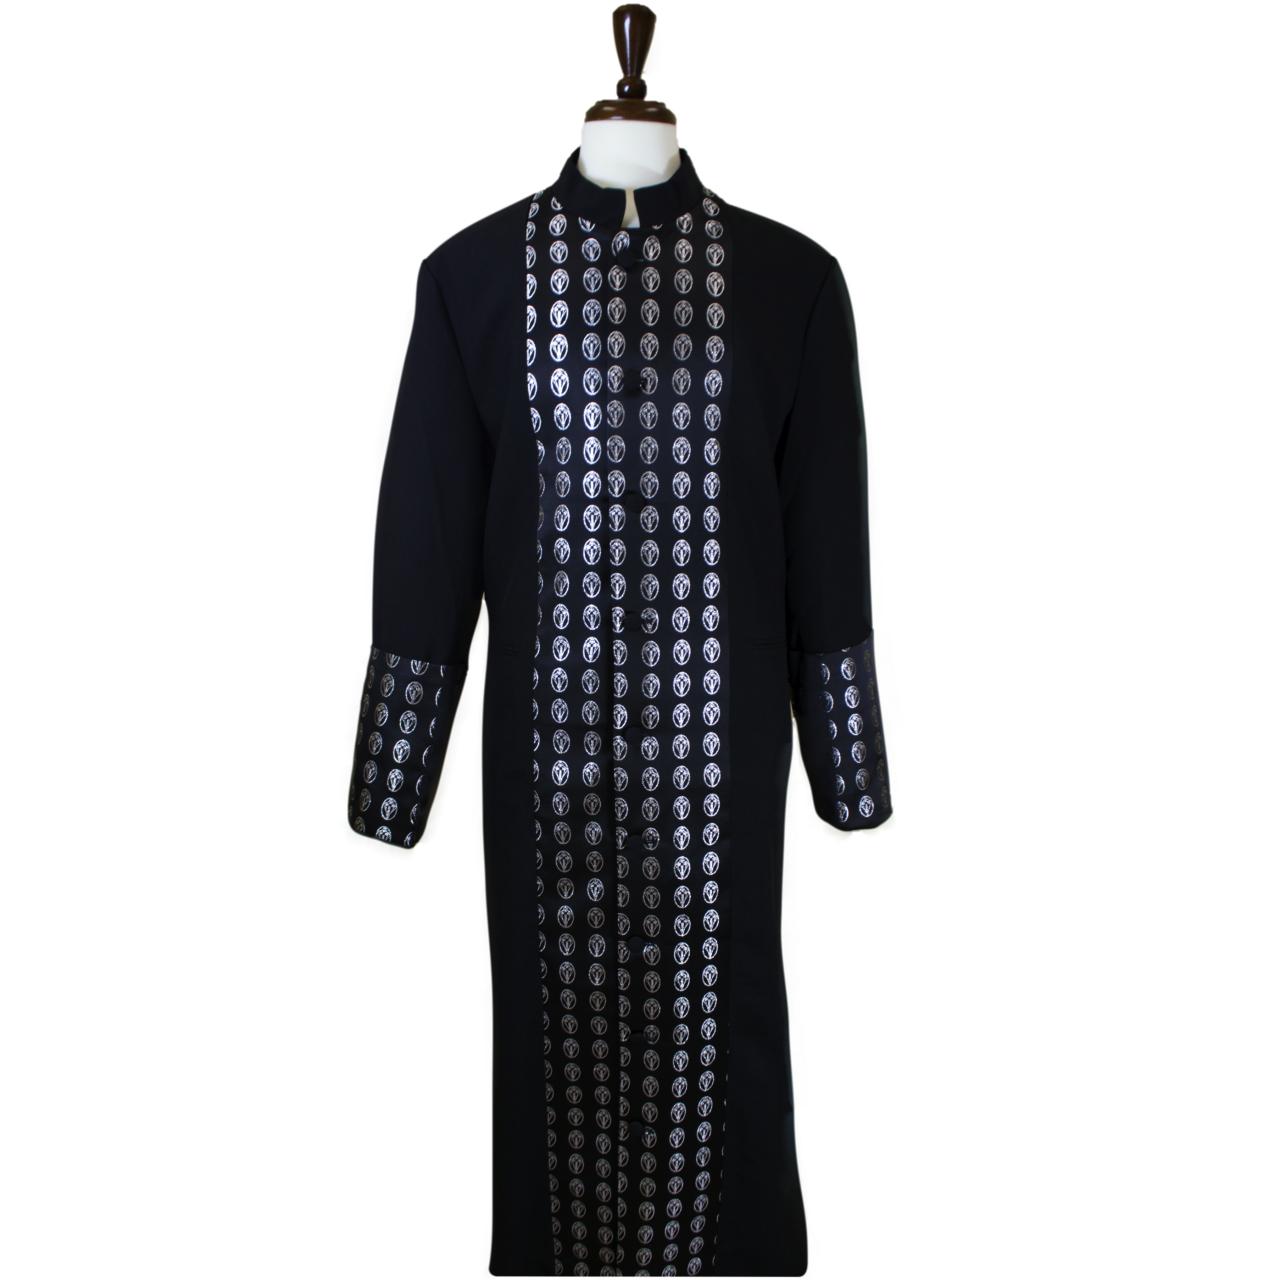 802 M. Men's Premium Pastor/Clergy Robe - Black/Silver Metallic Brocade